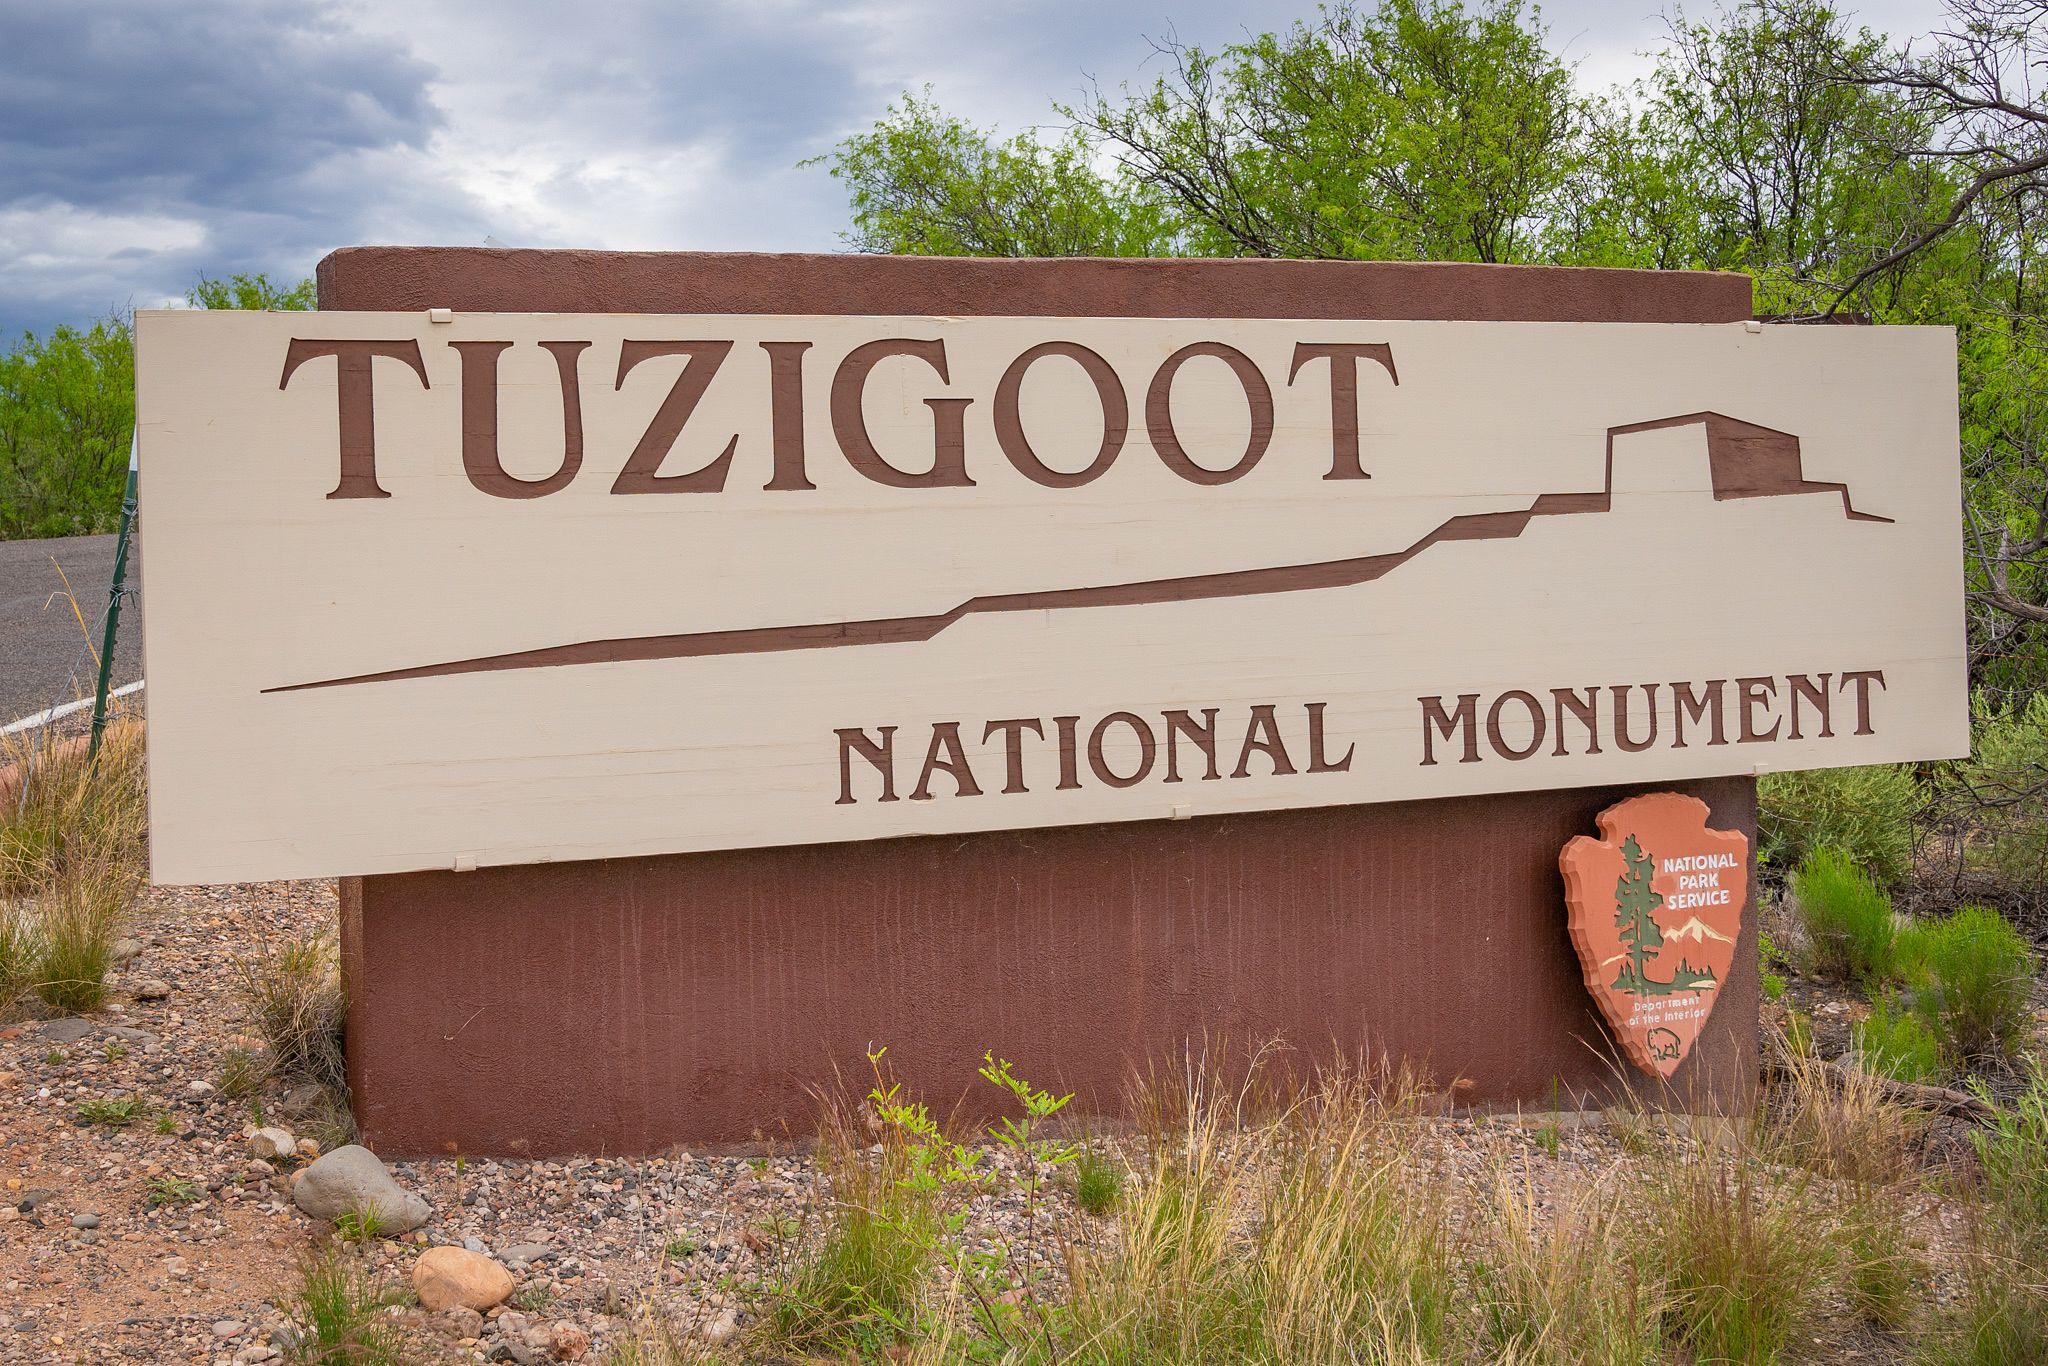 Tuzigoot National Monument Entrance Sign